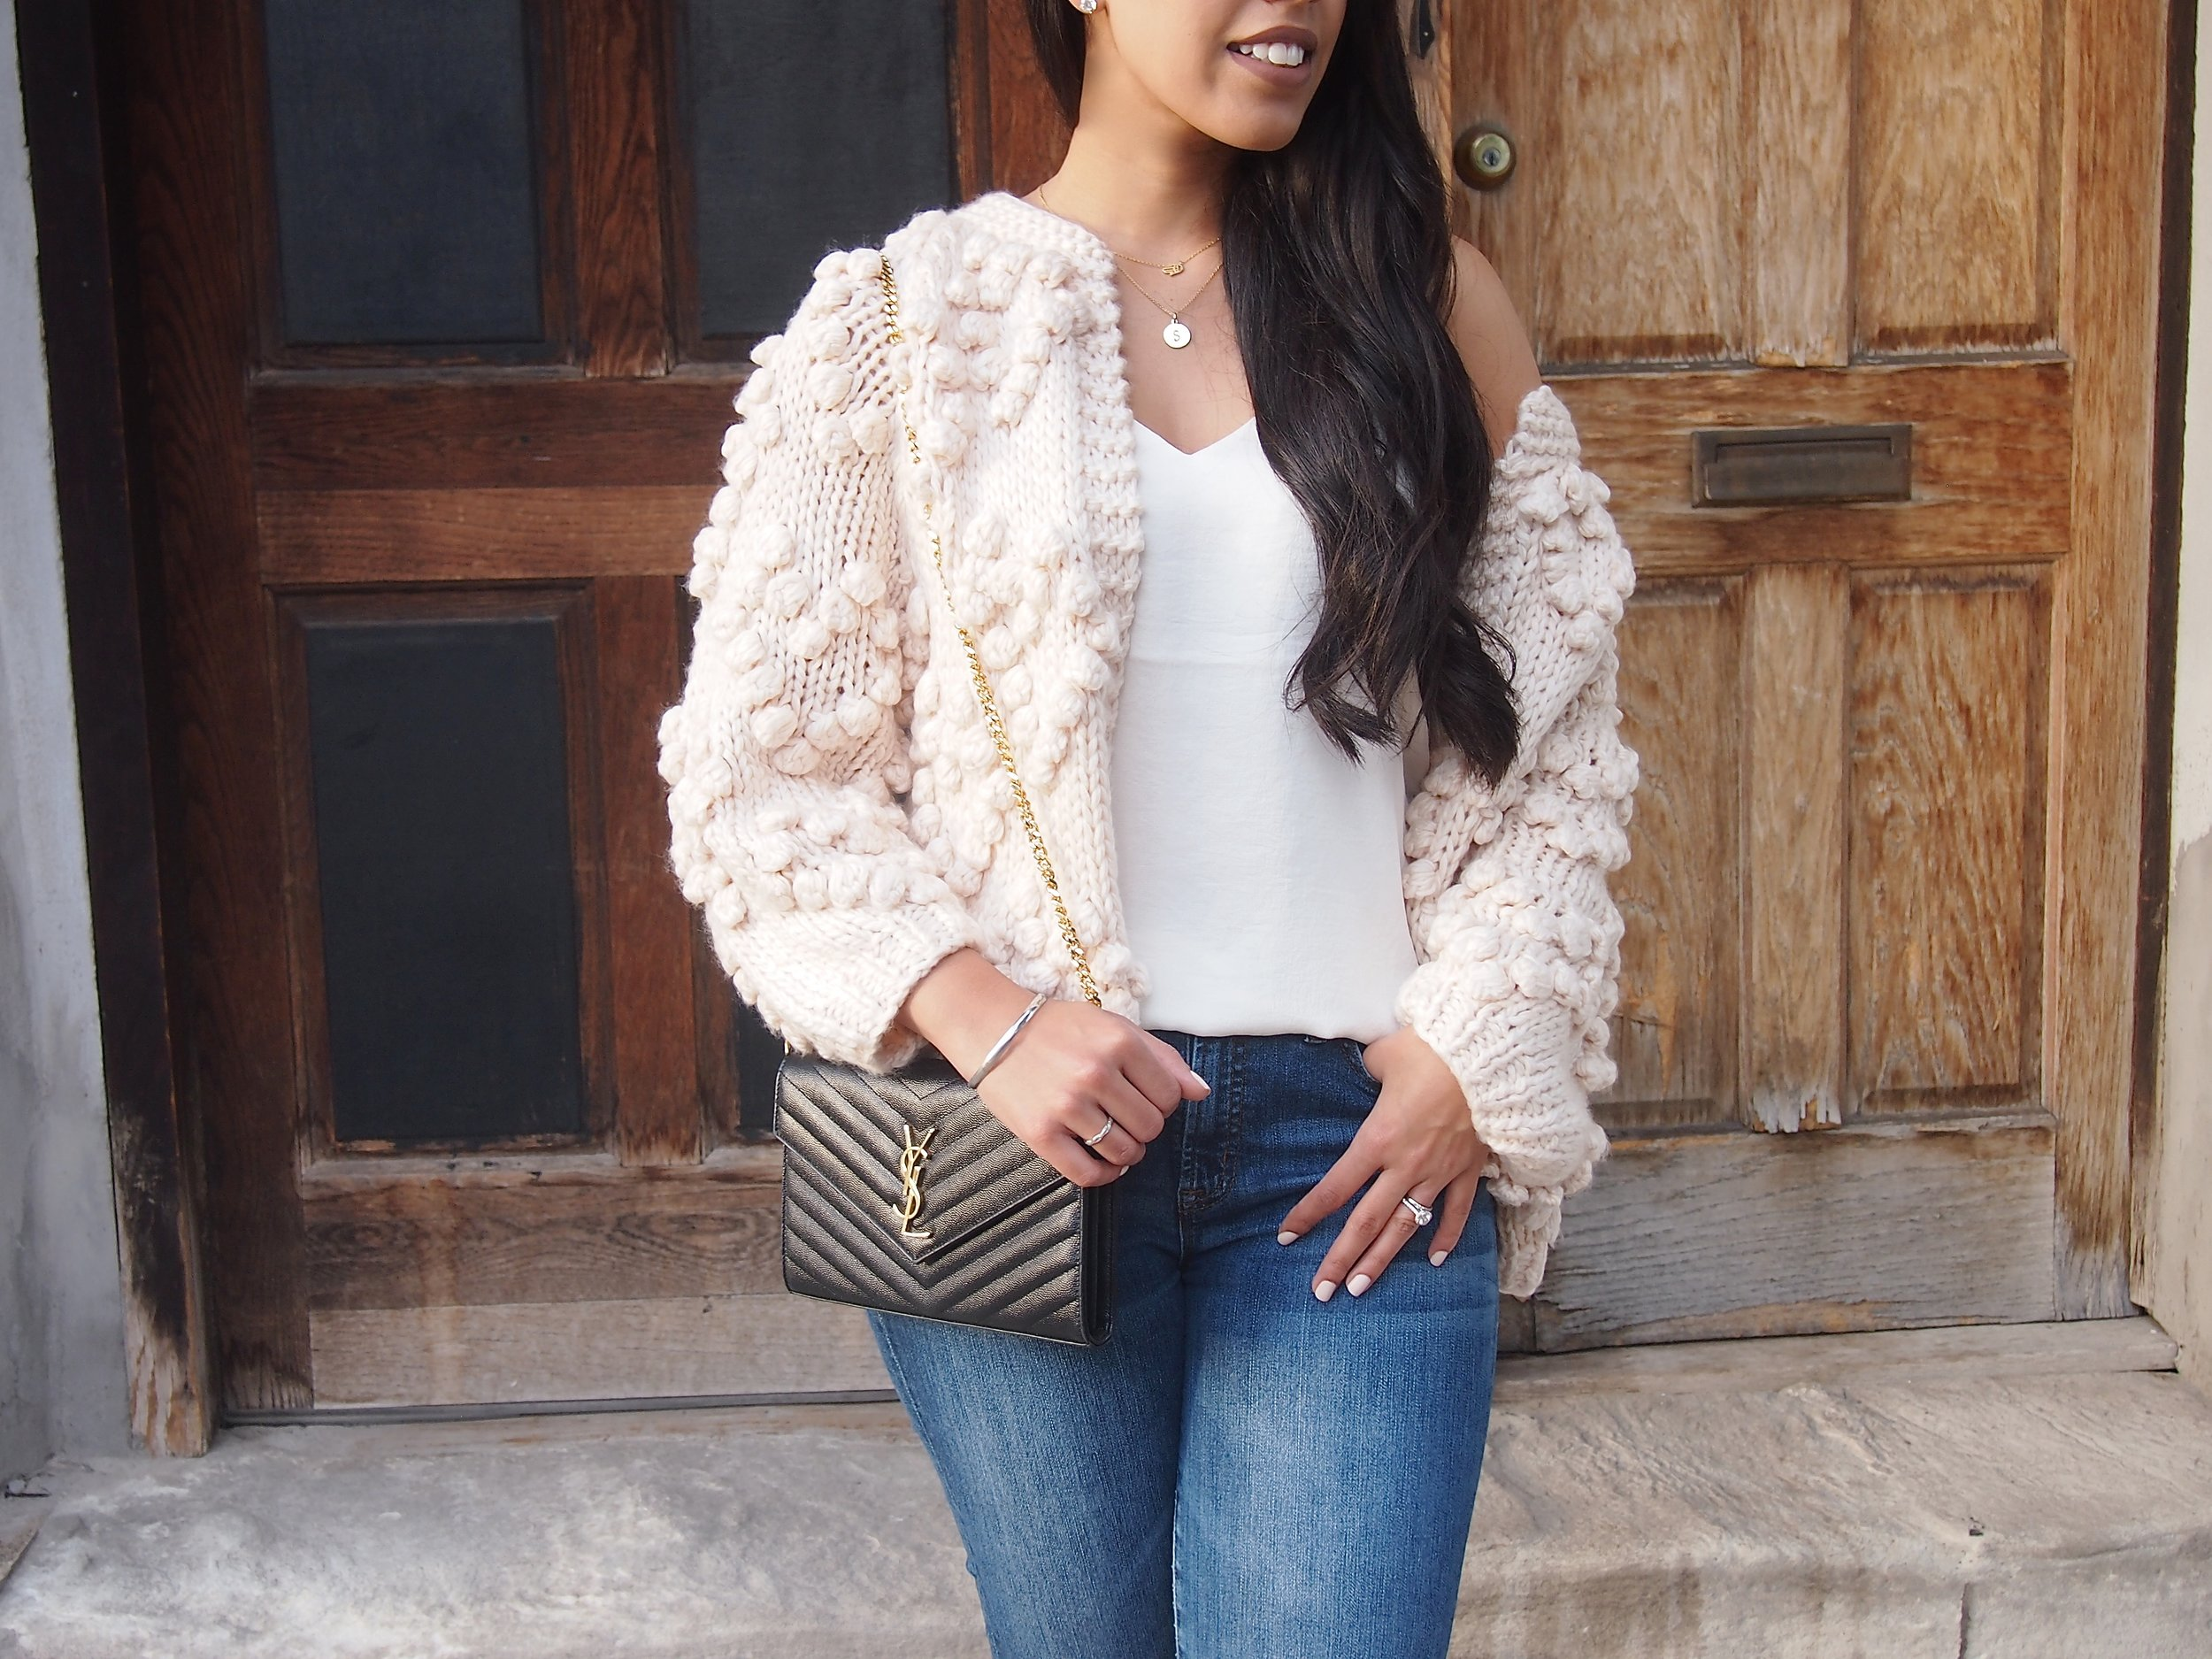 pom-pom-sweater-chicwish-fall-fashion-blogger.JPG